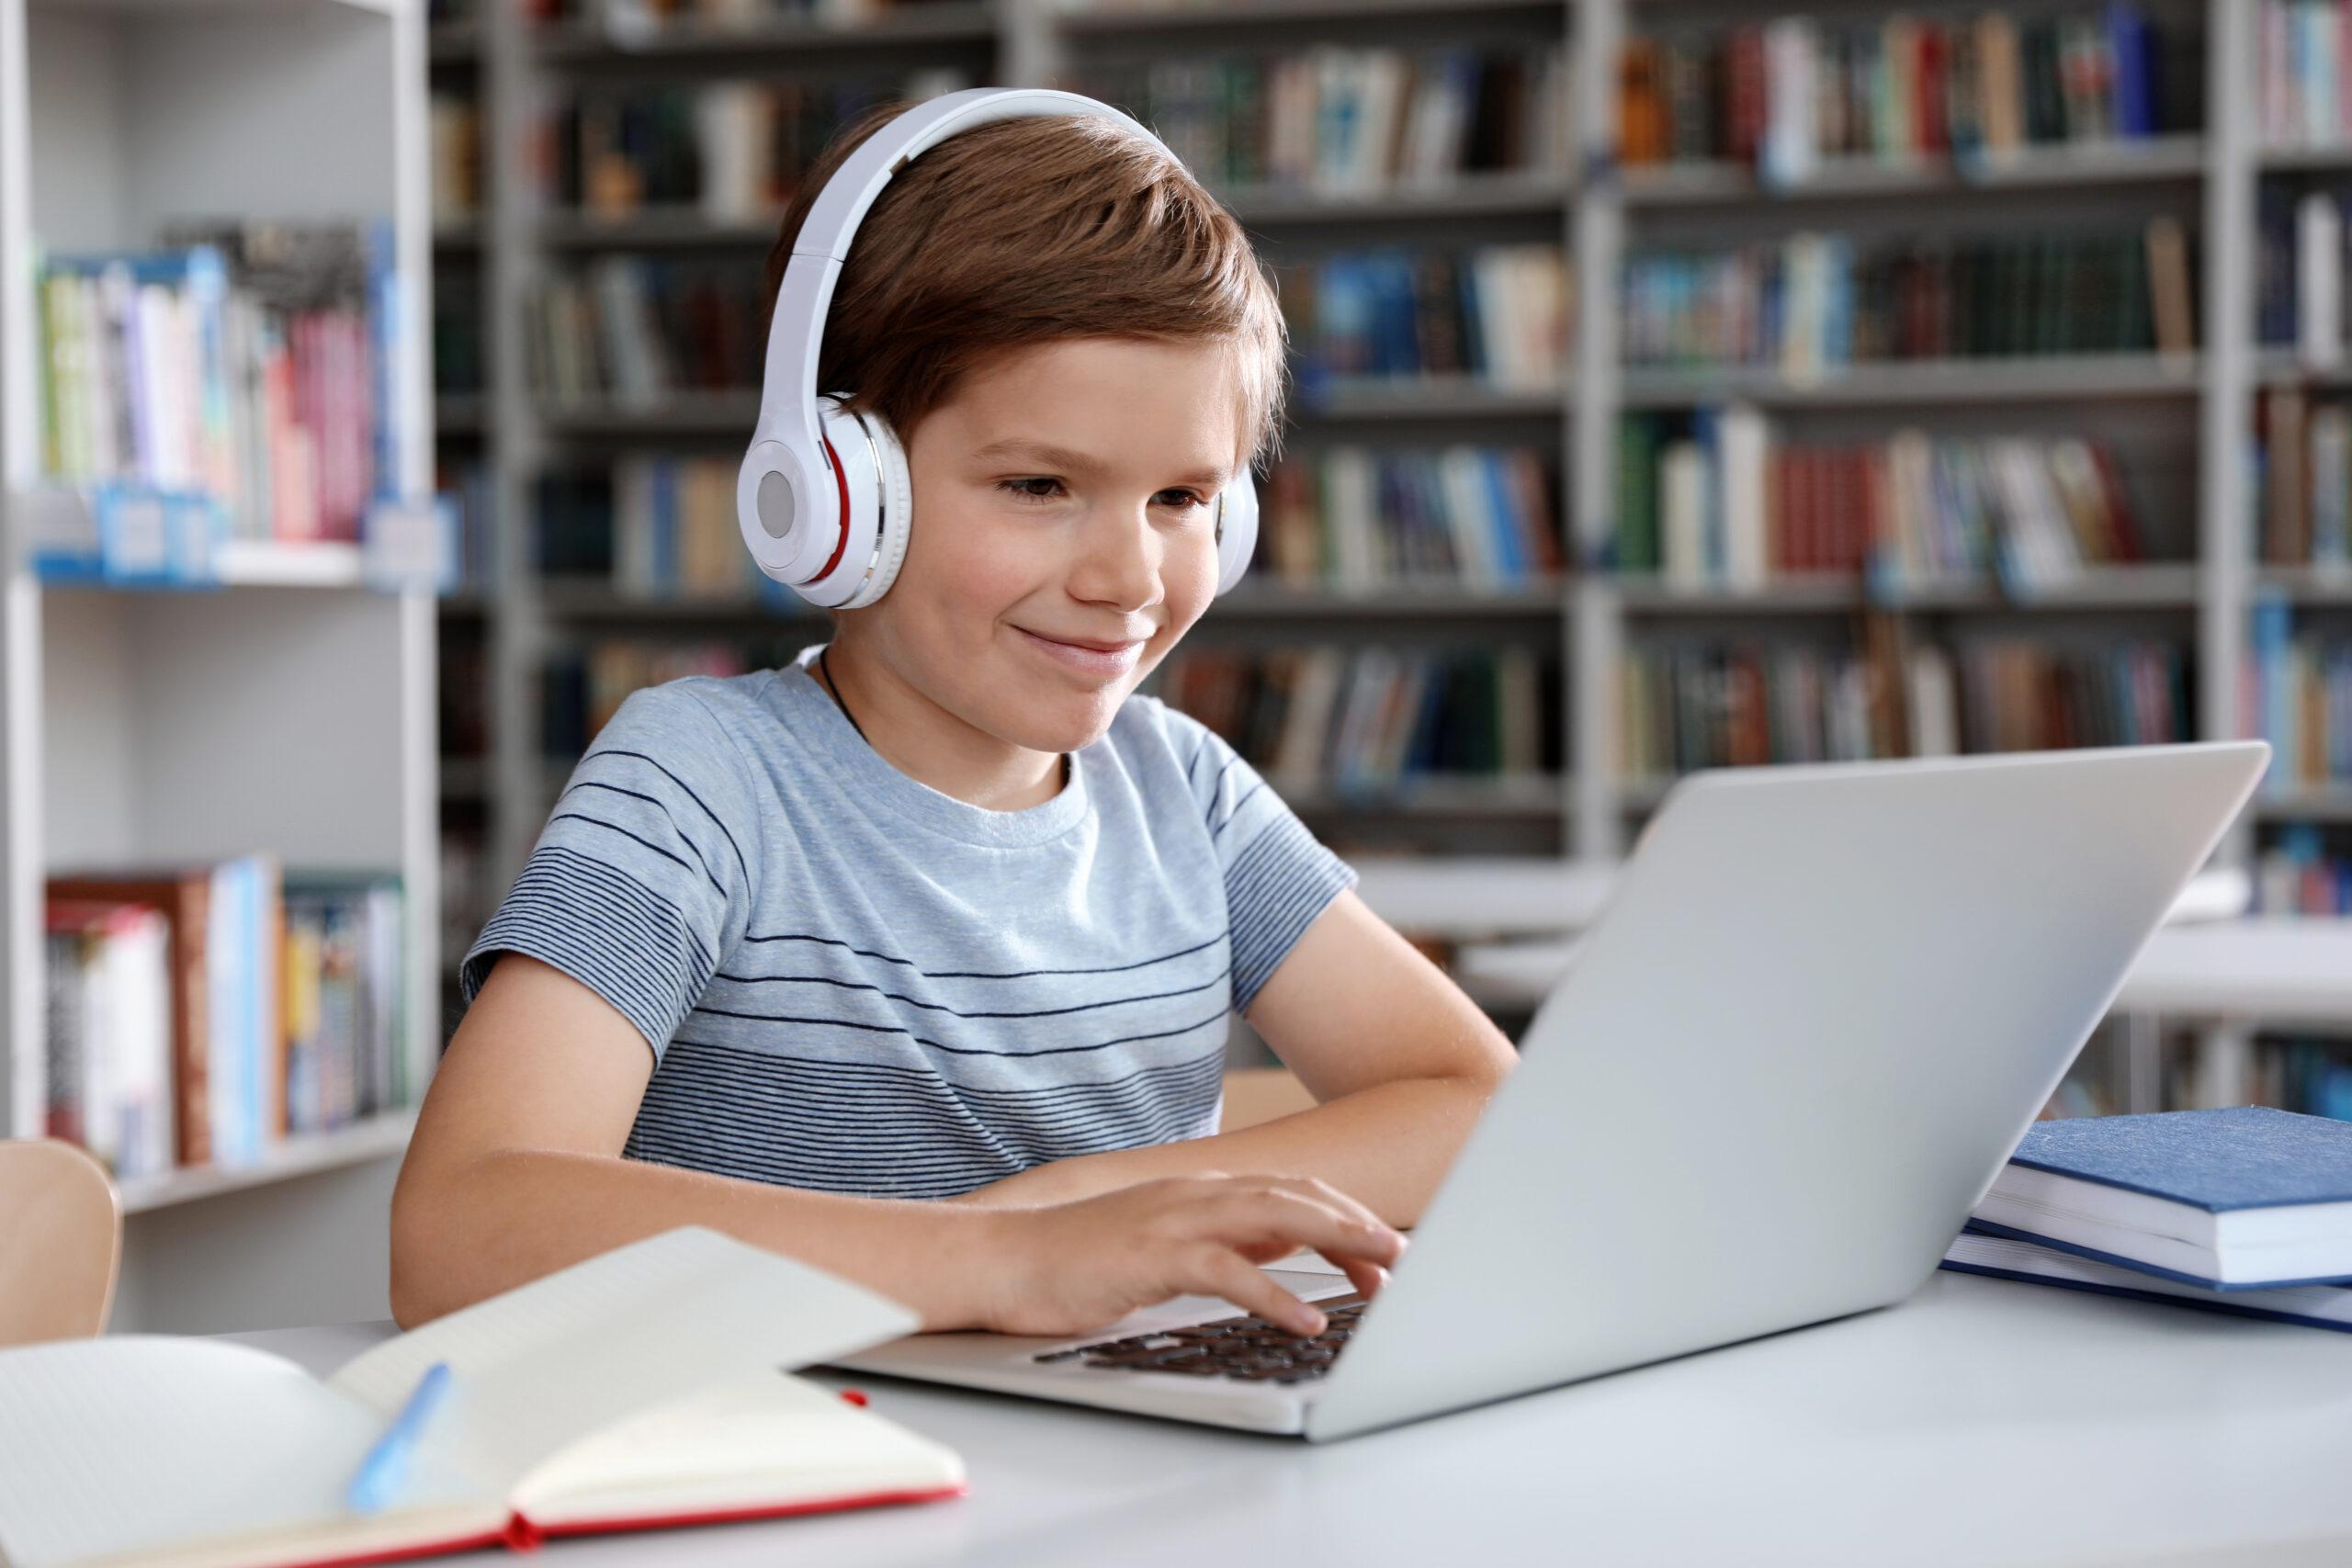 Online therapy, therapy online, online therapist, therapist online, teletherapy, online child therapist, child therapist online